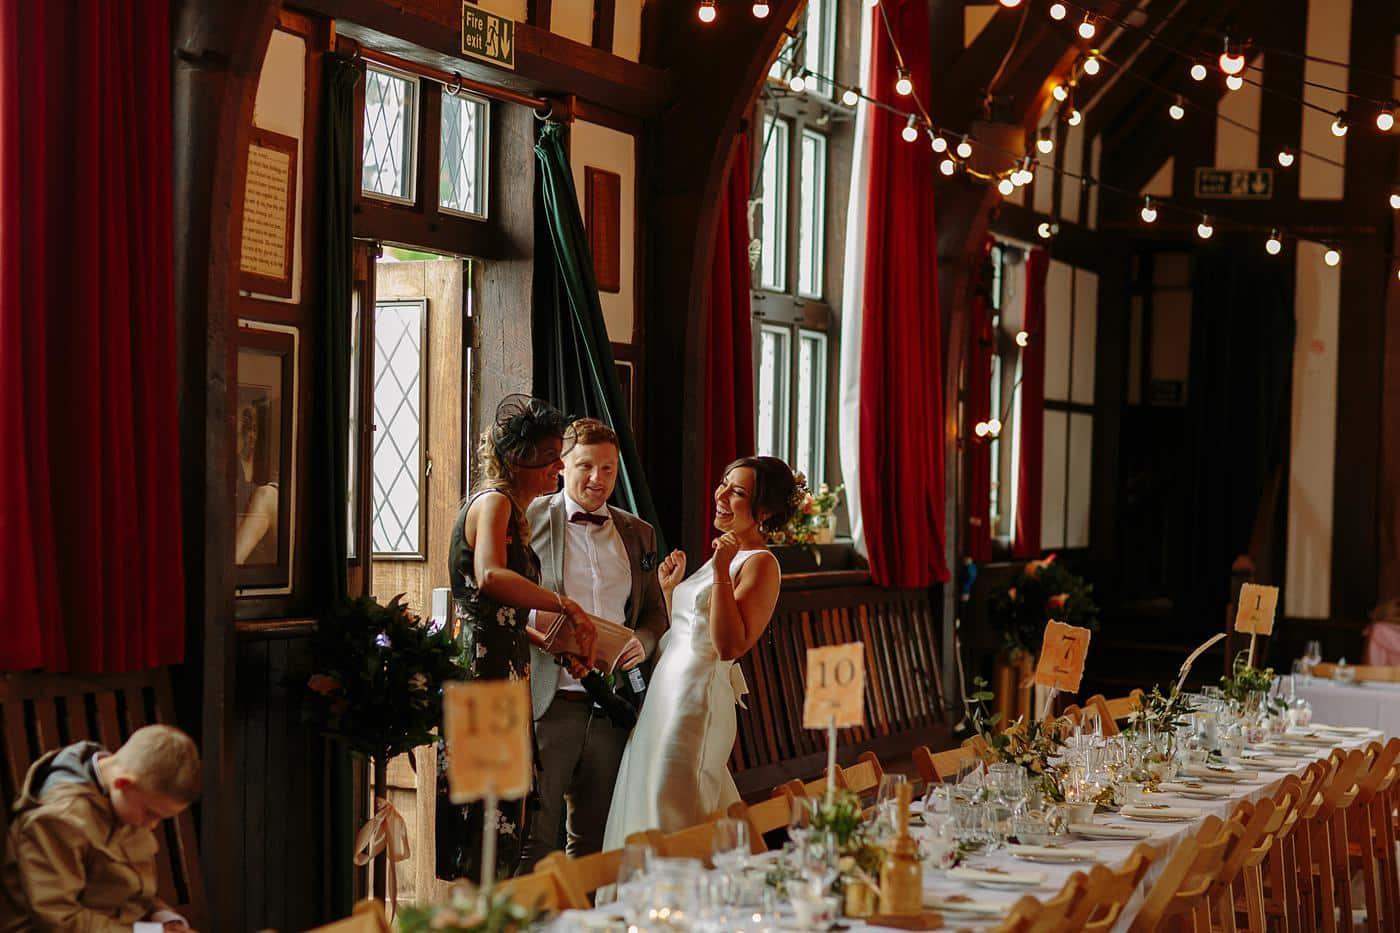 Winstanstow wedding photography 0600